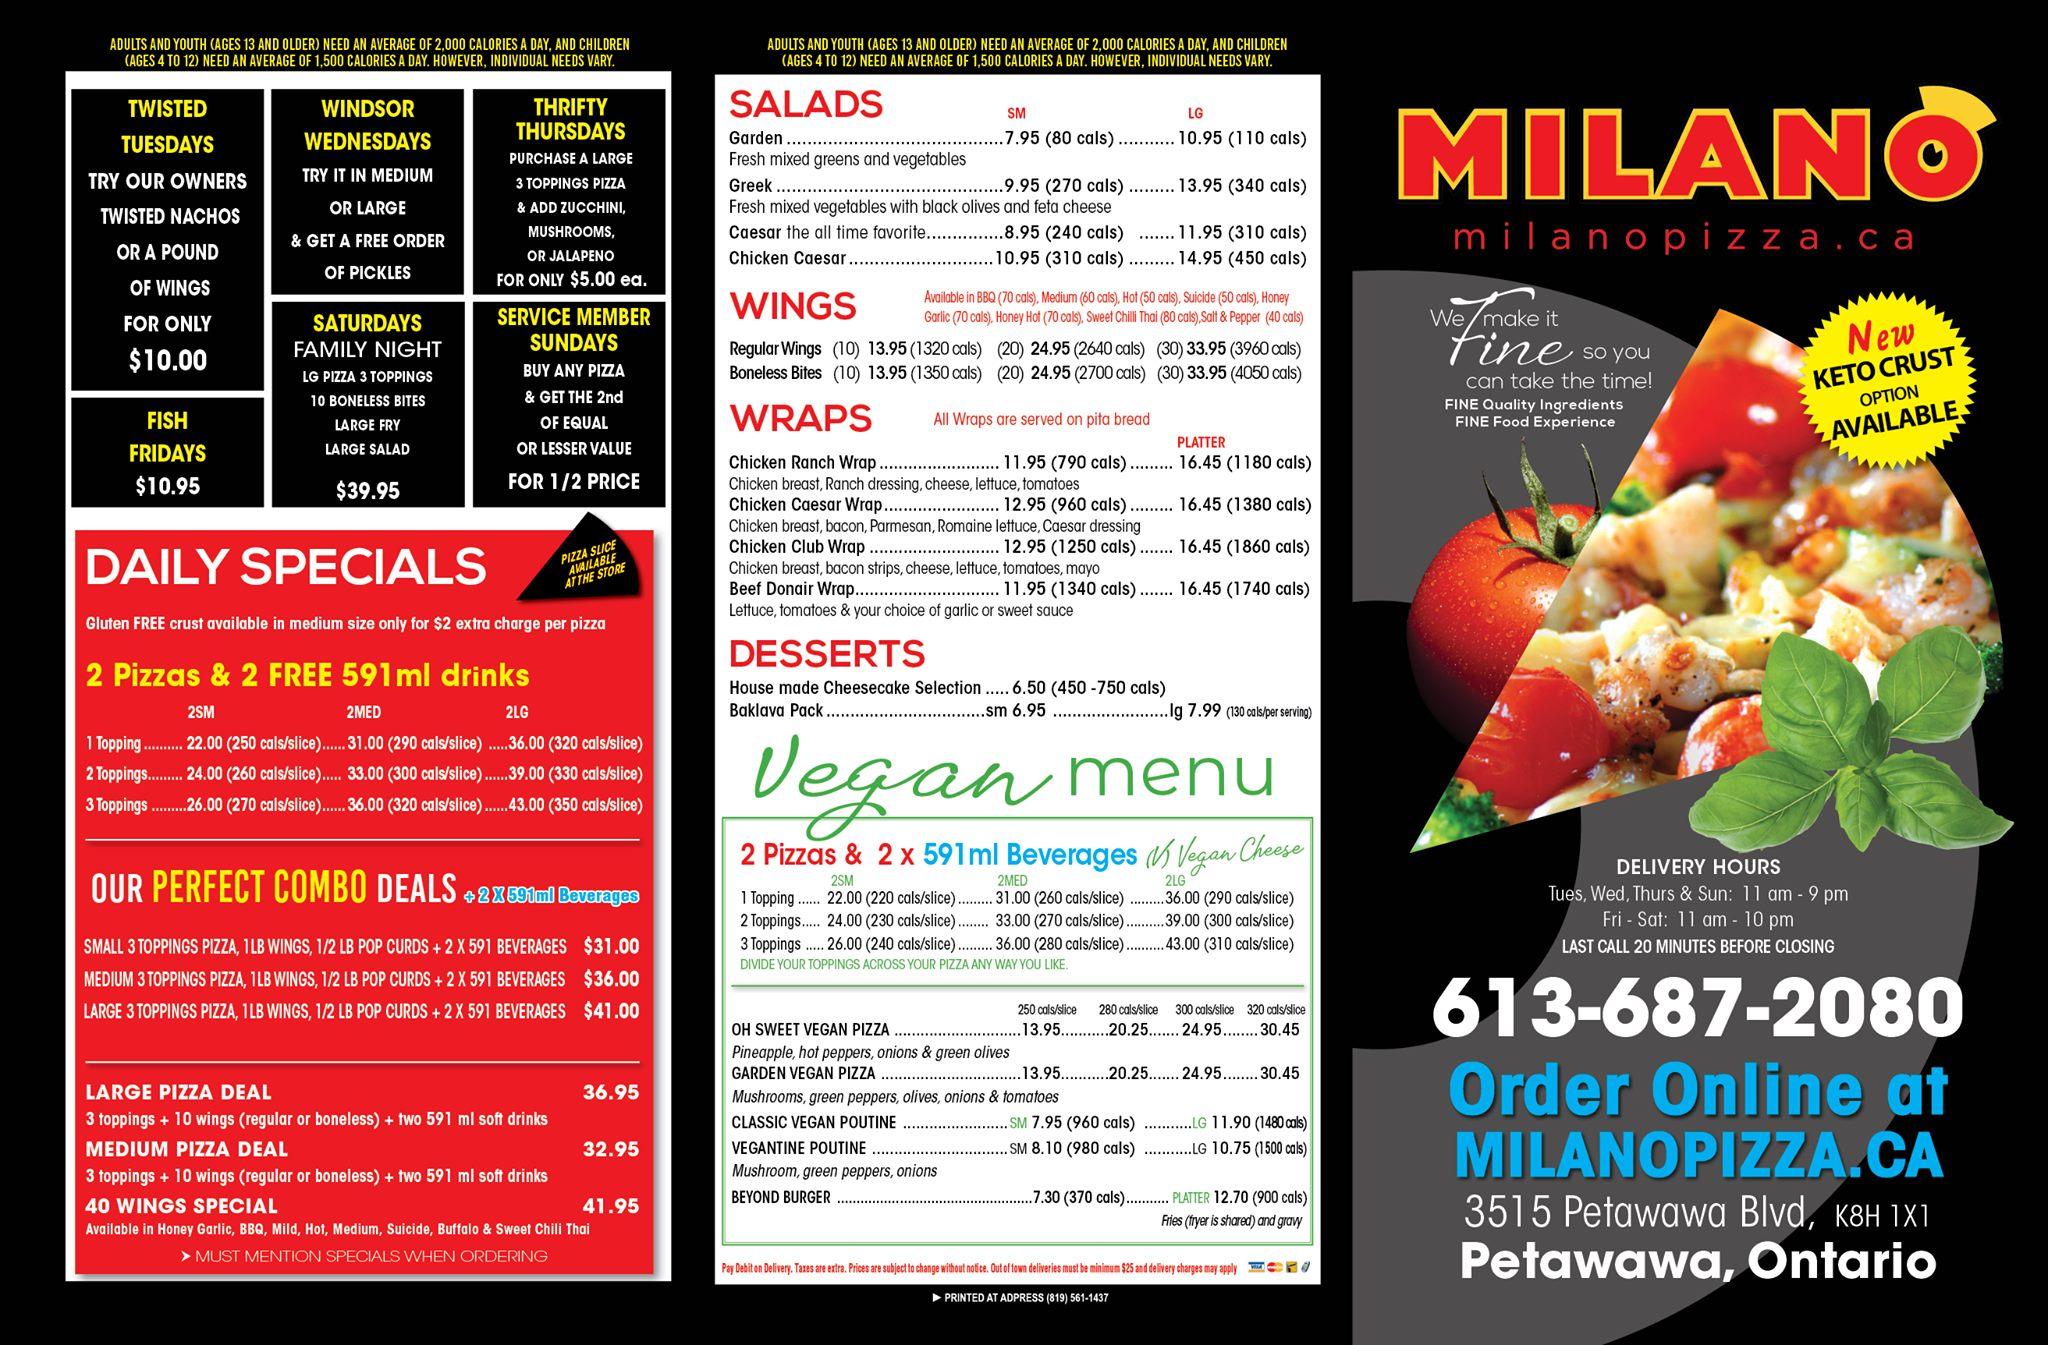 A menu detailing items in Milano's Pizzeria Petawawa